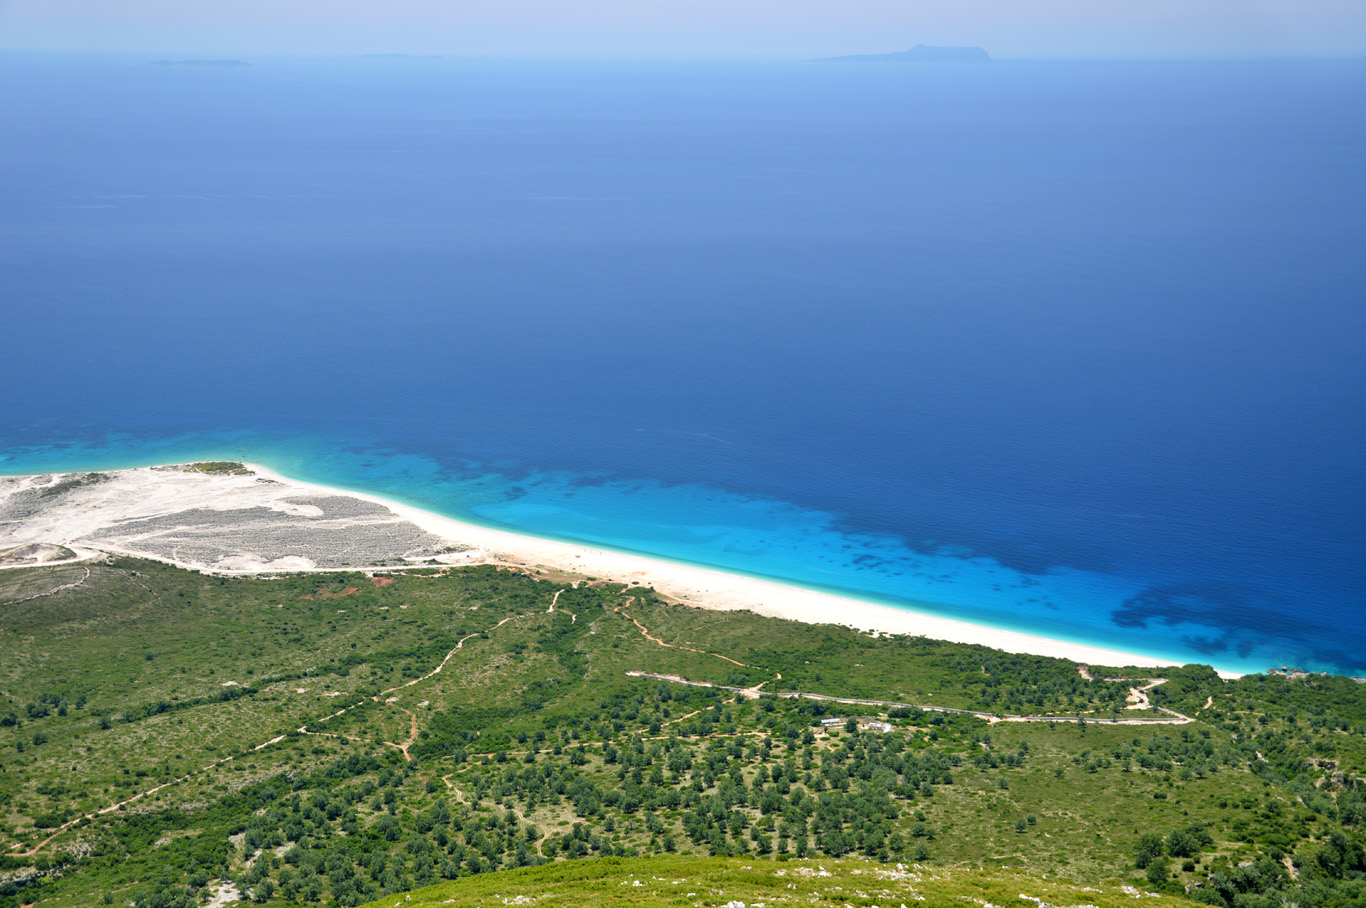 Drymades Beach seen from Llogara